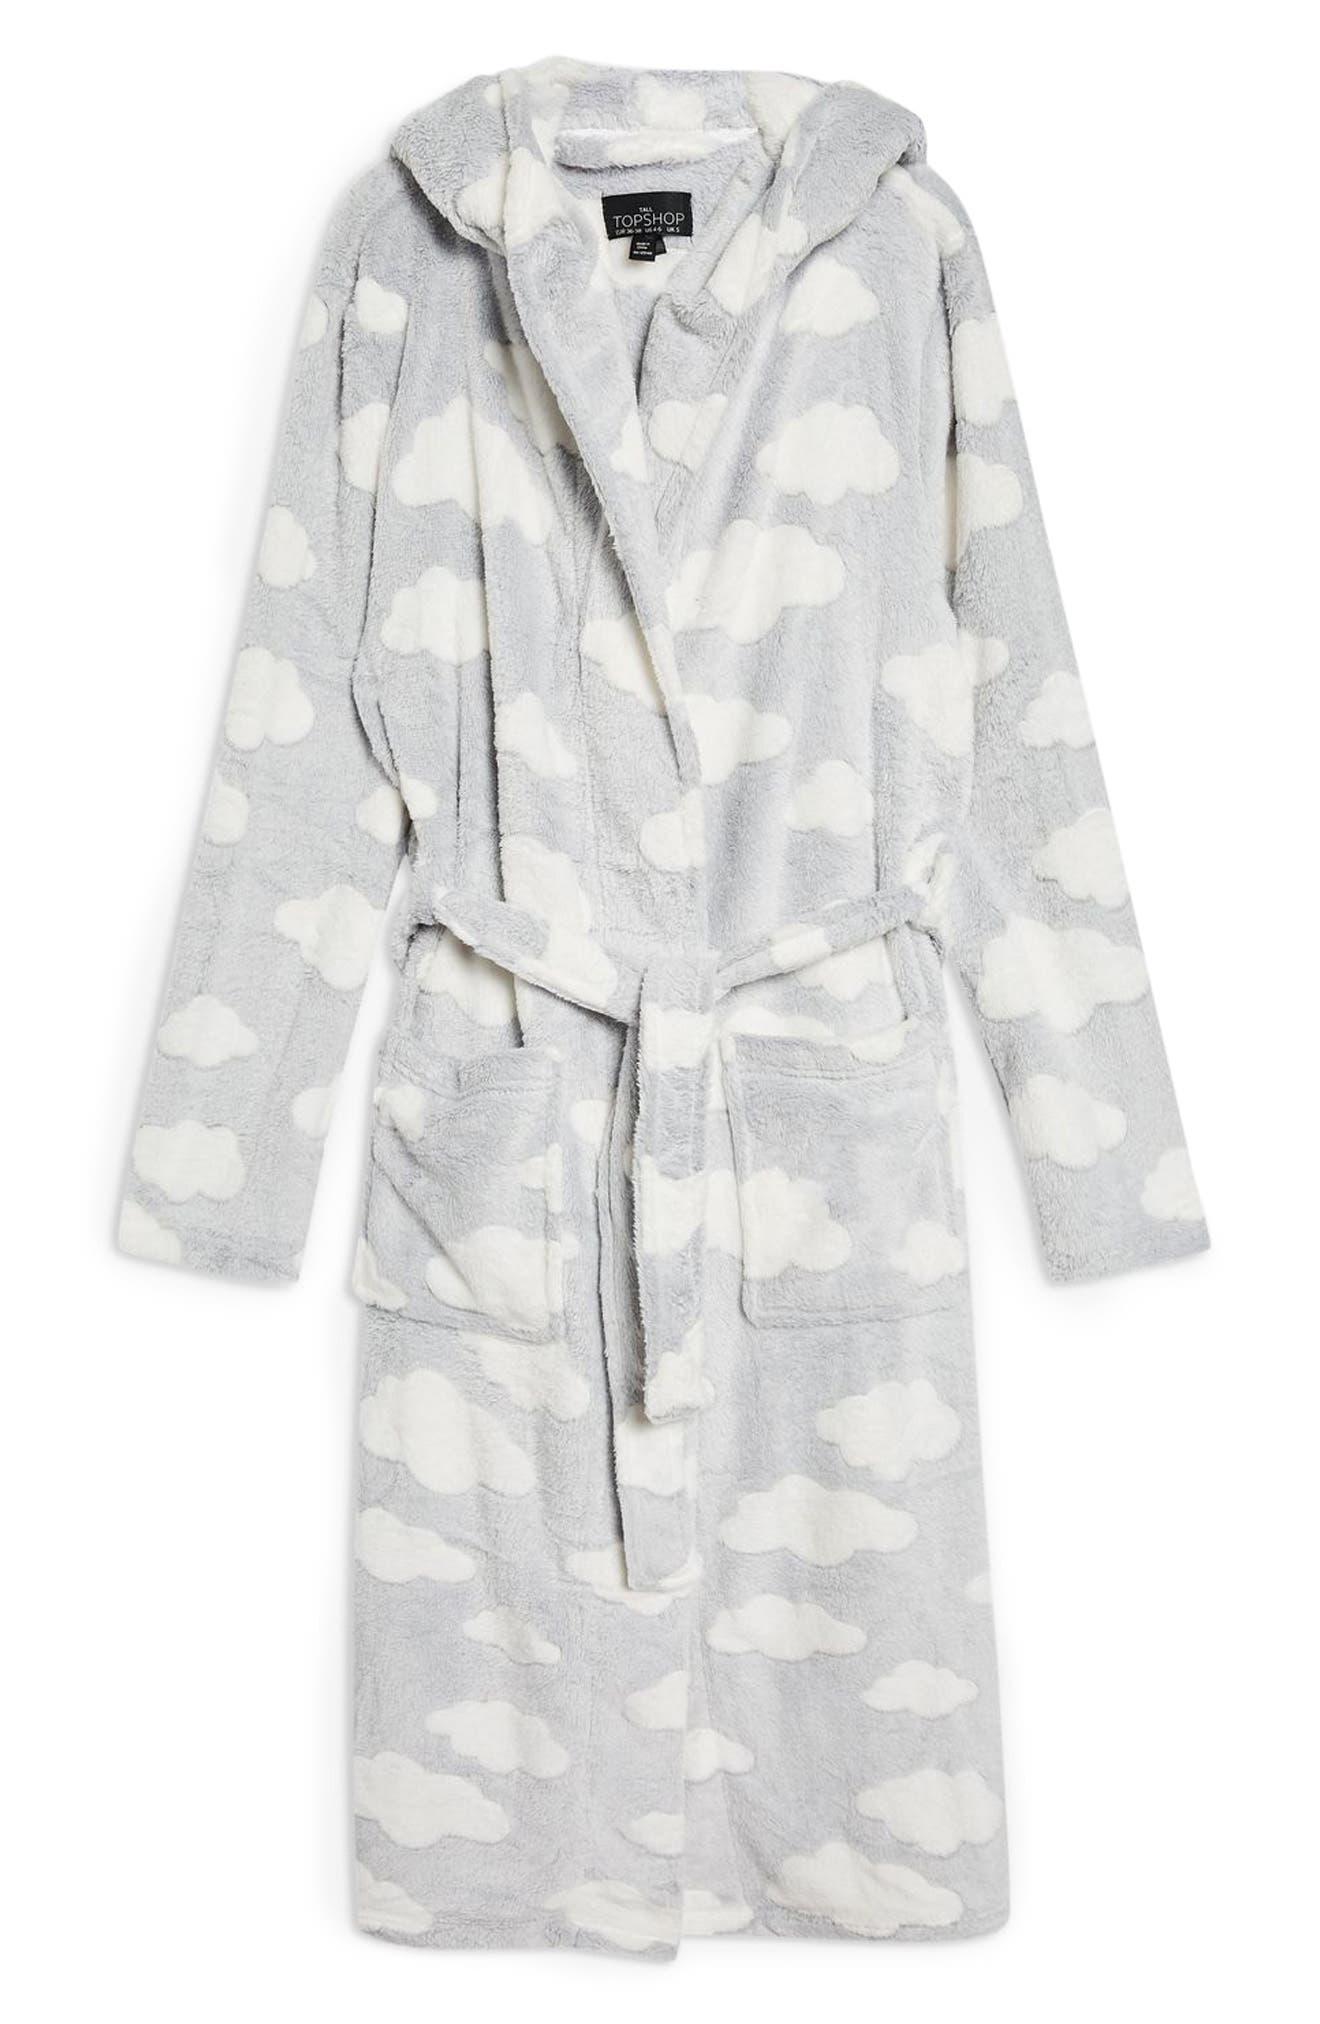 Cloud Print Longline Fleece Robe,                             Alternate thumbnail 3, color,                             020